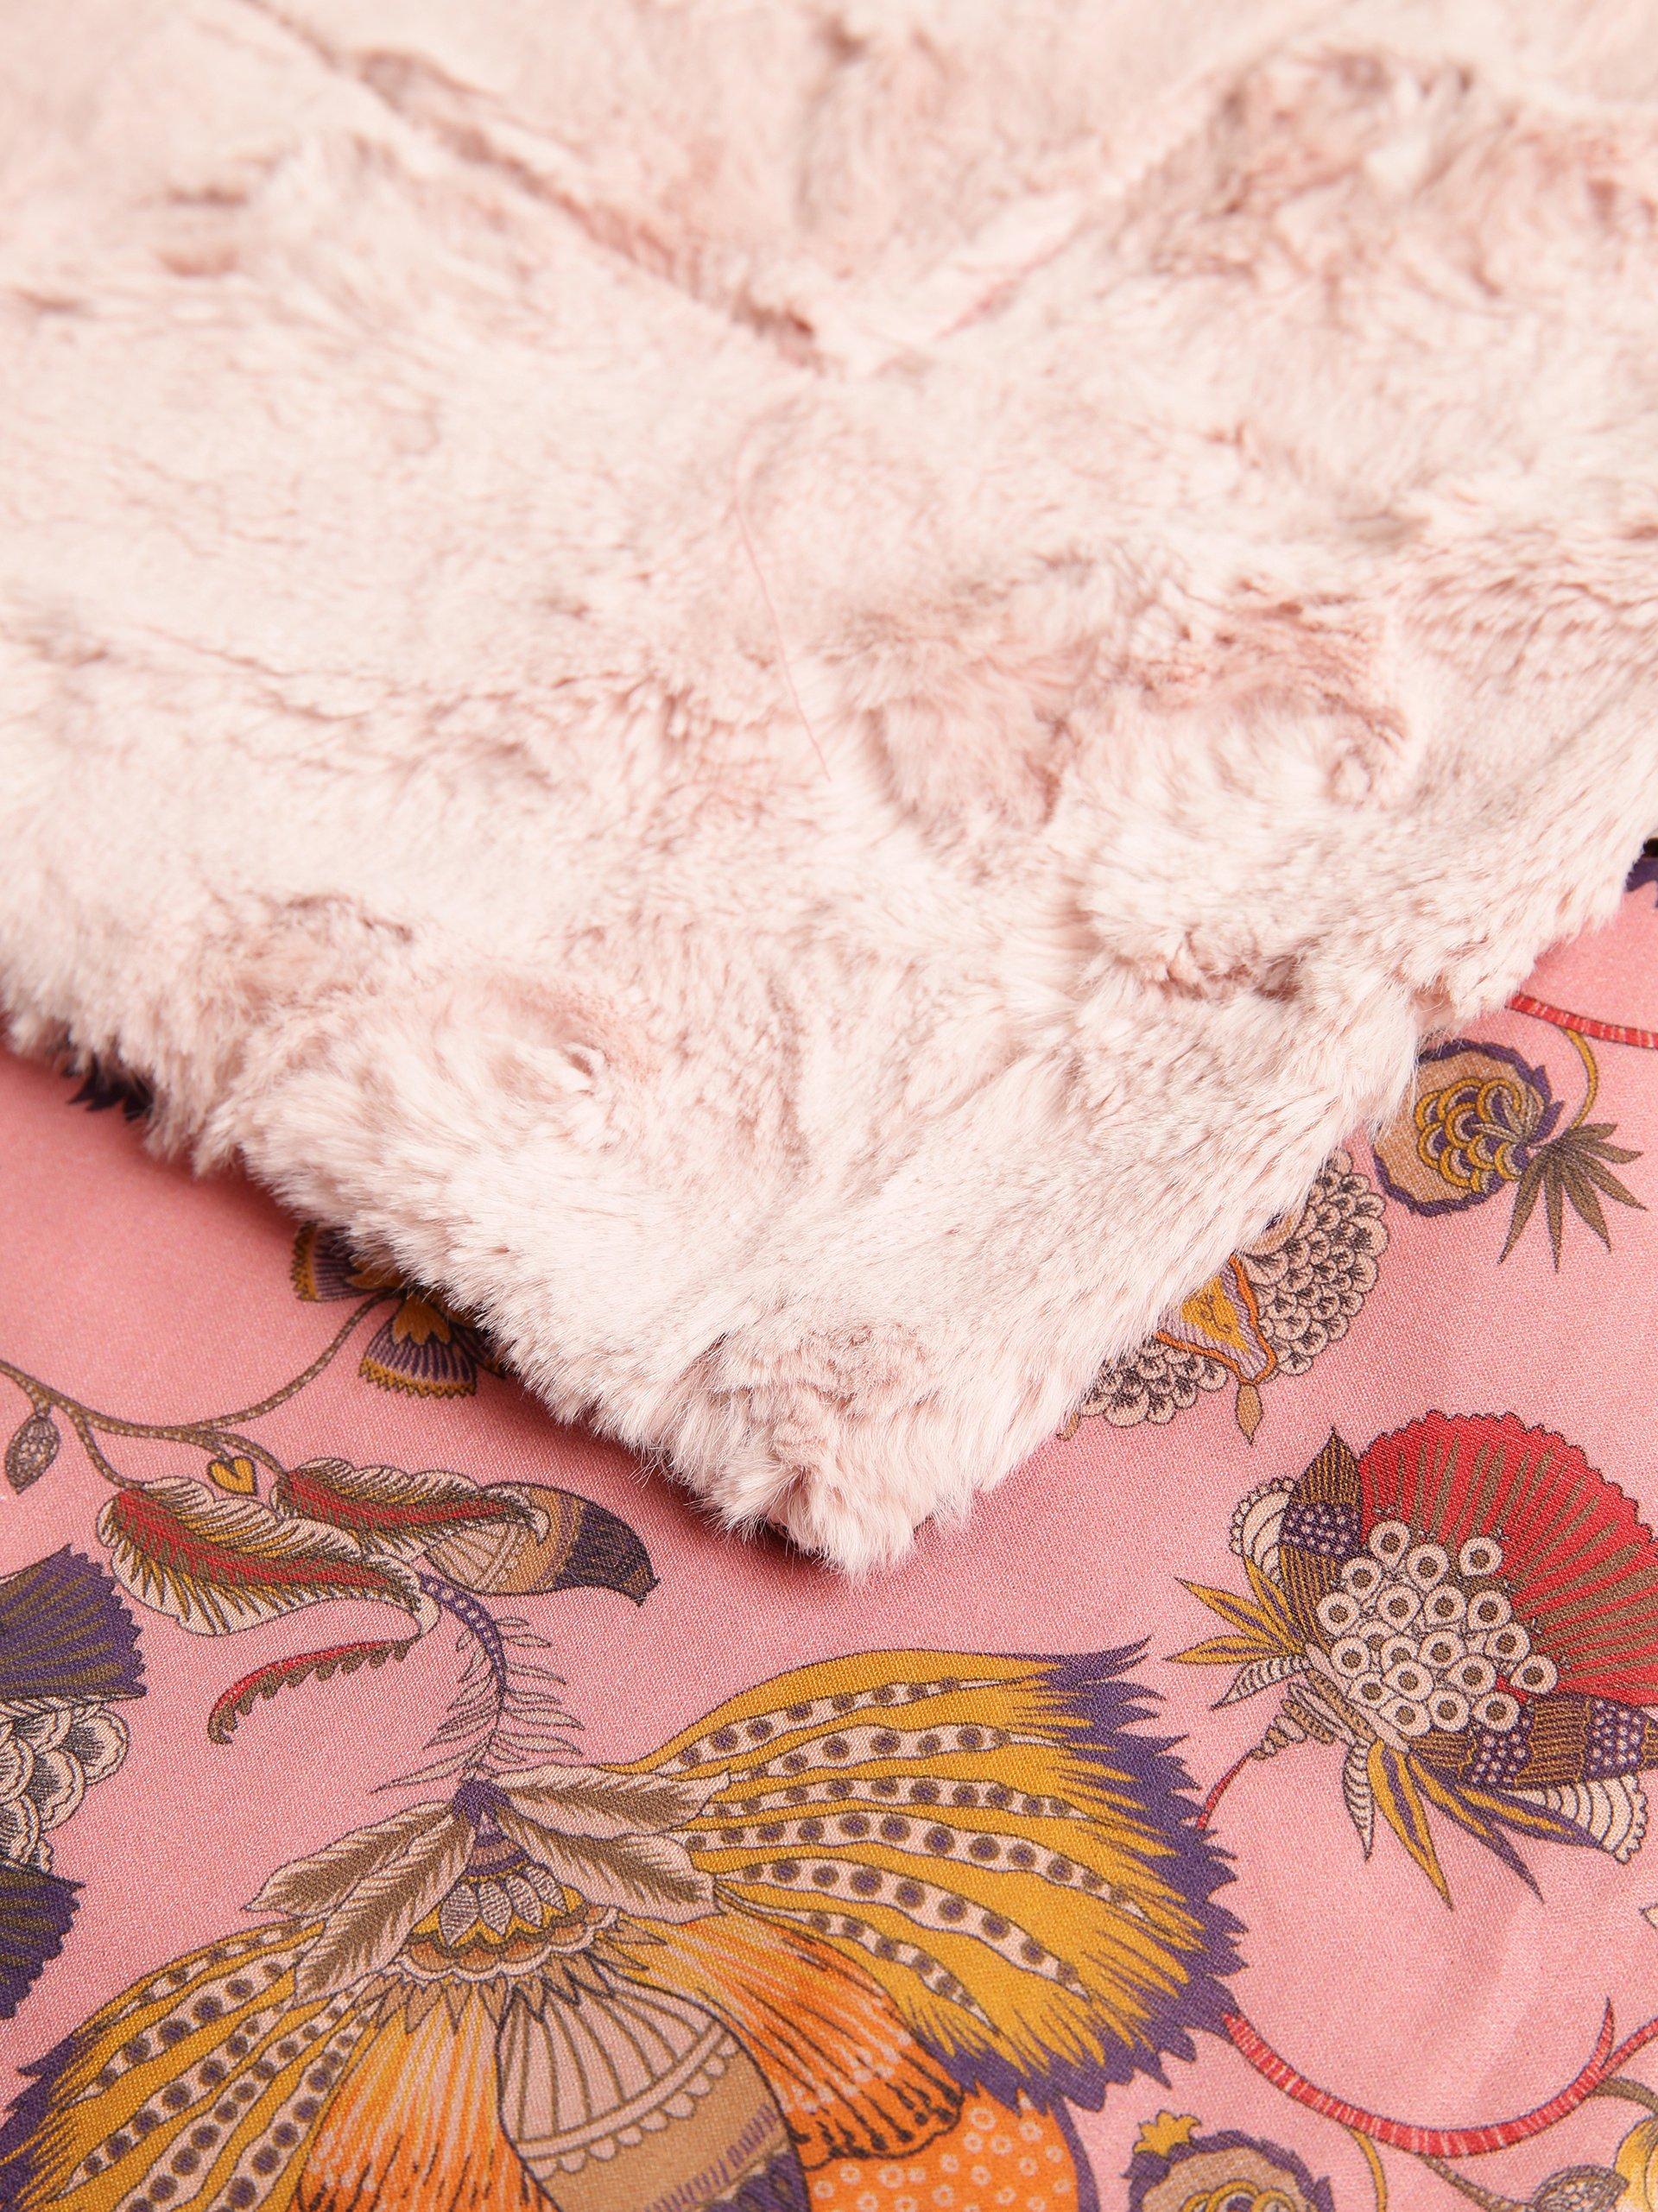 marc cain additions damen tagesdecke rosa gemustert online kaufen vangraaf com. Black Bedroom Furniture Sets. Home Design Ideas